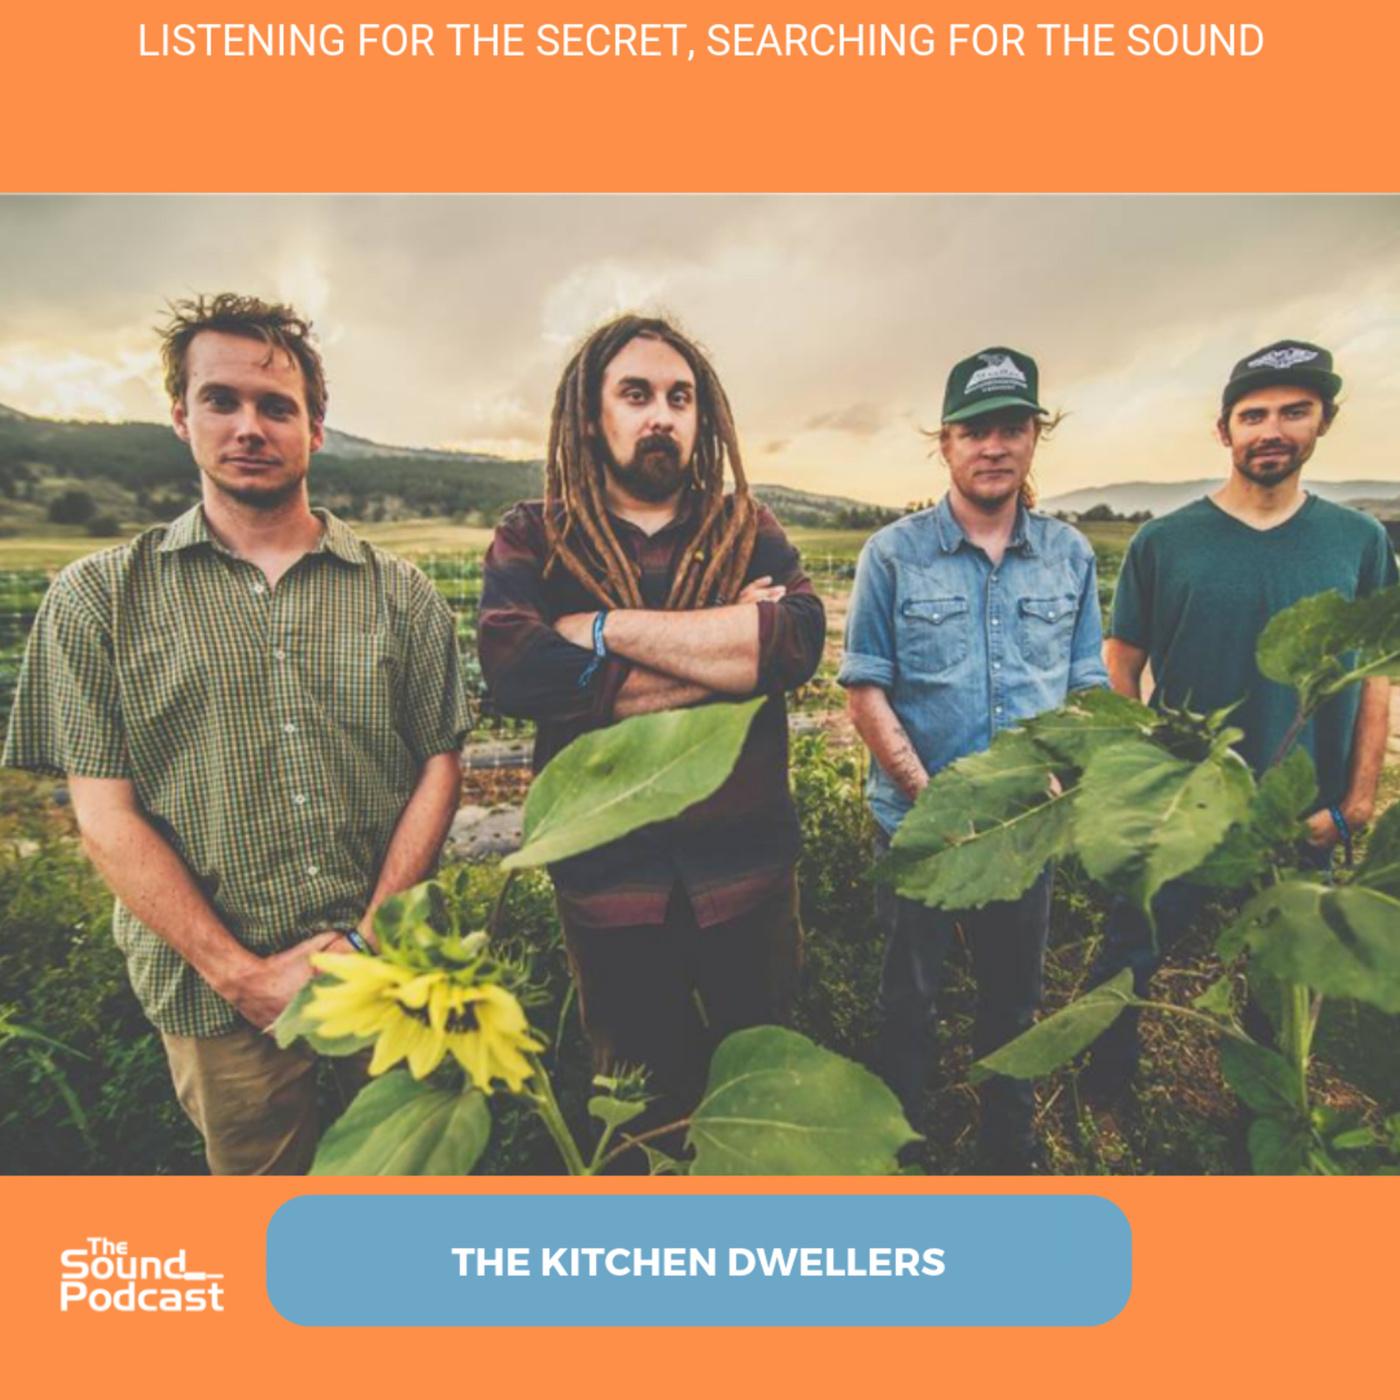 Episode 158: The Kitchen Dwellers